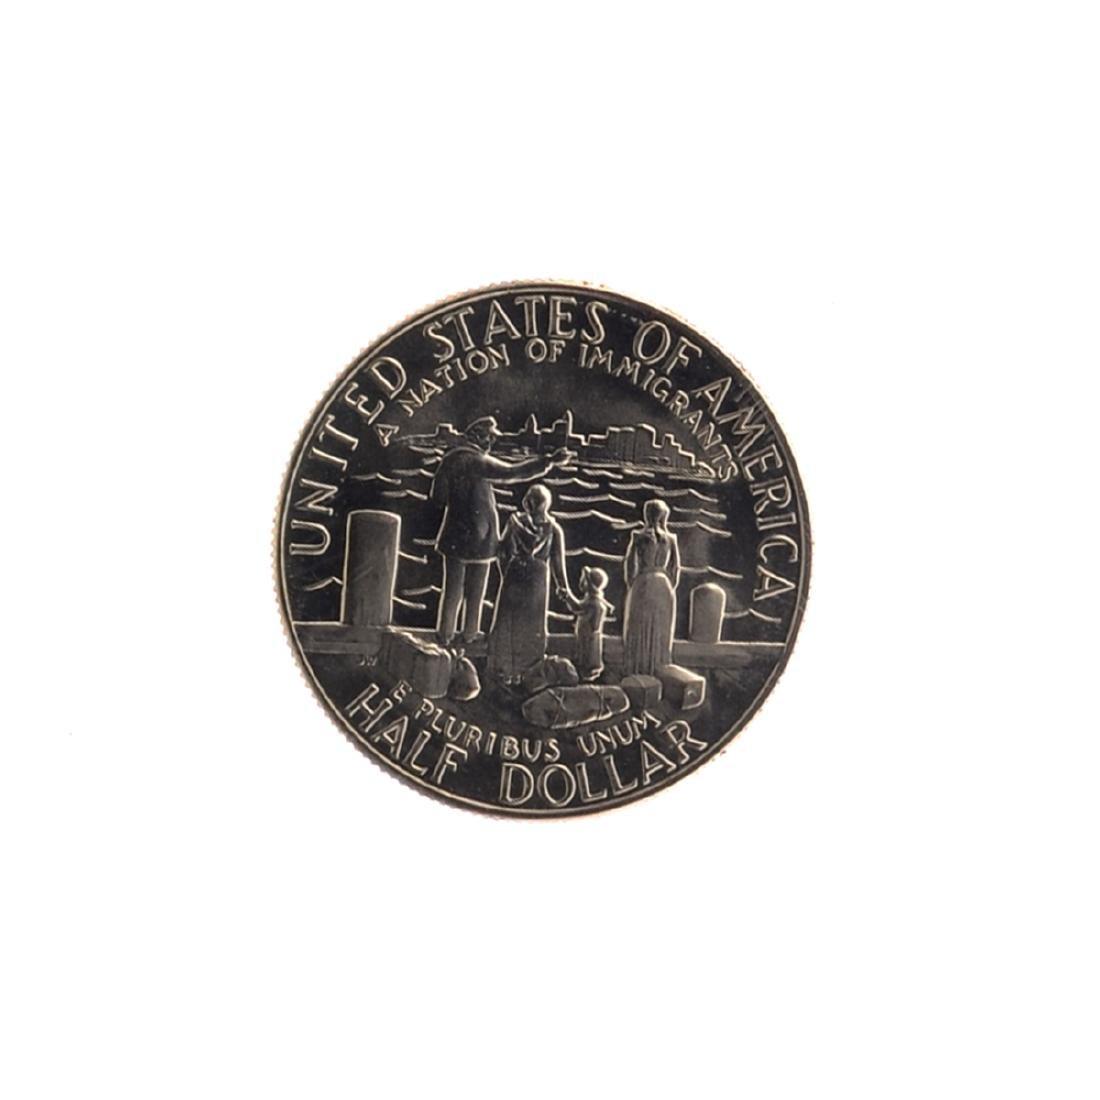 1986 Uncirculated Liberty Half Dollar Coin - 2